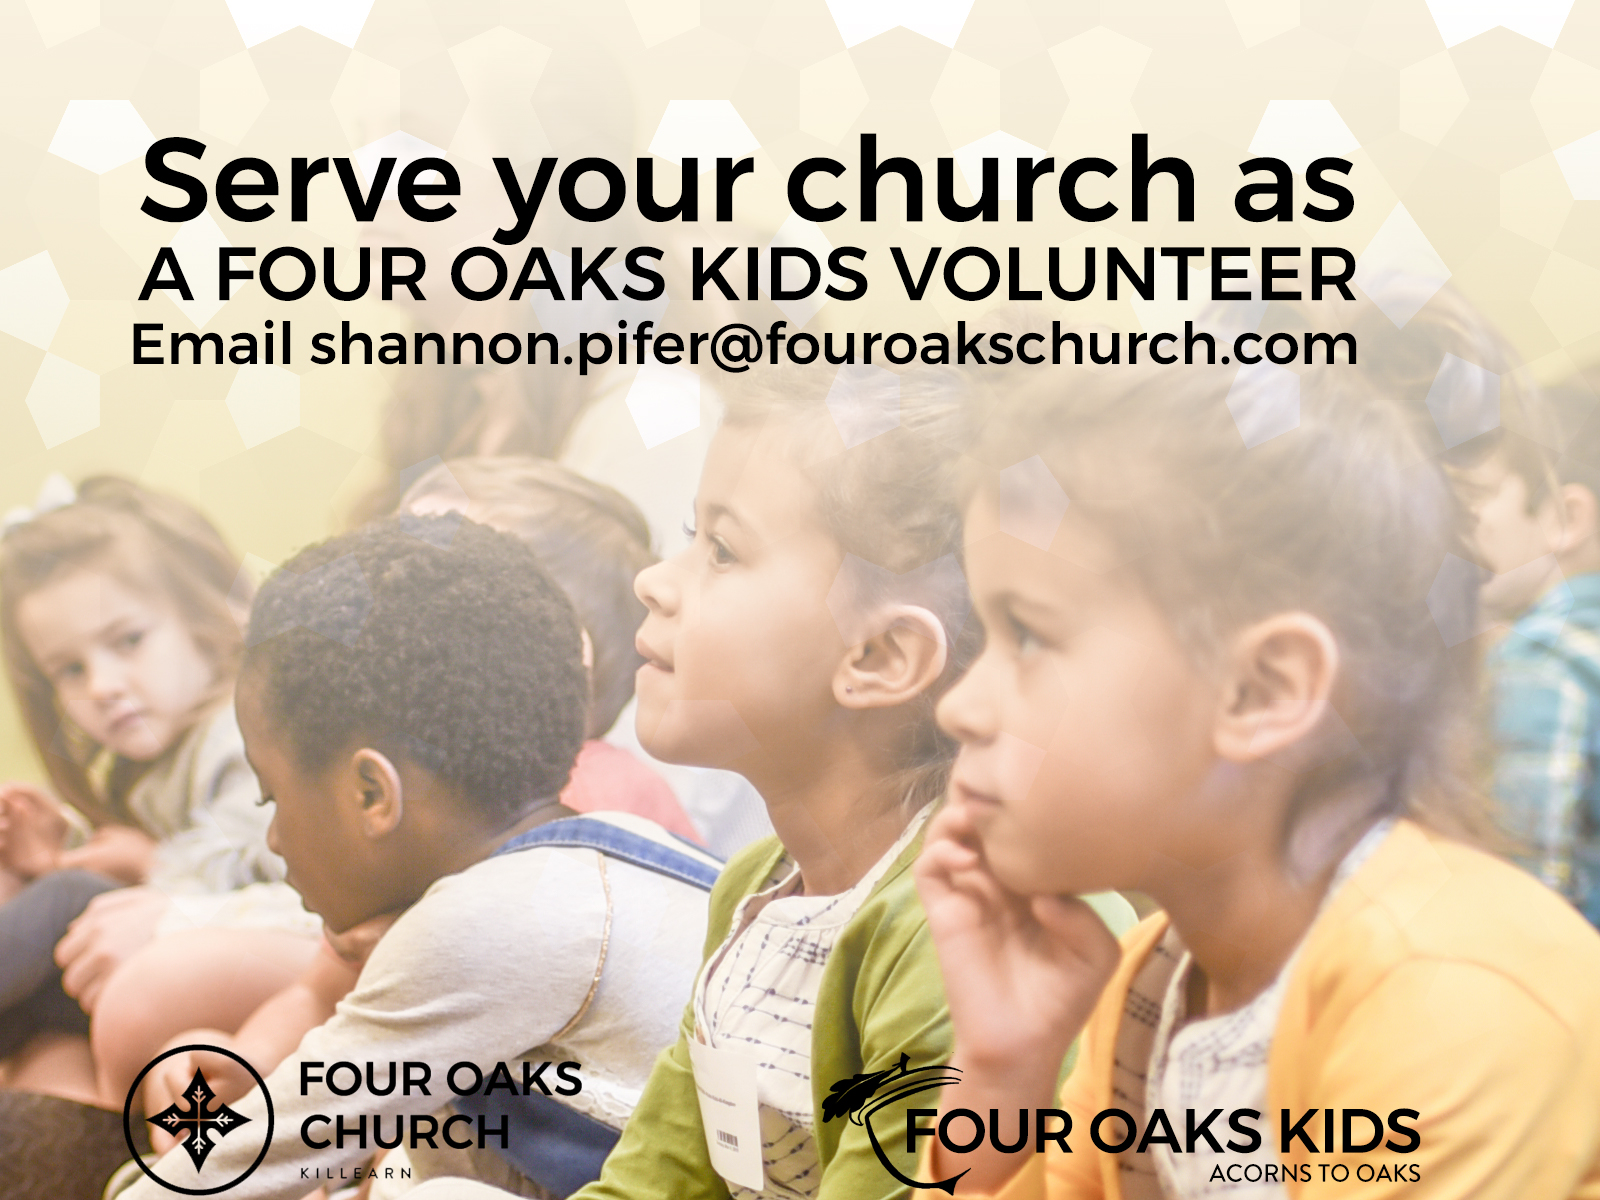 Sunday Volunteers Needed in Four Oaks Kids